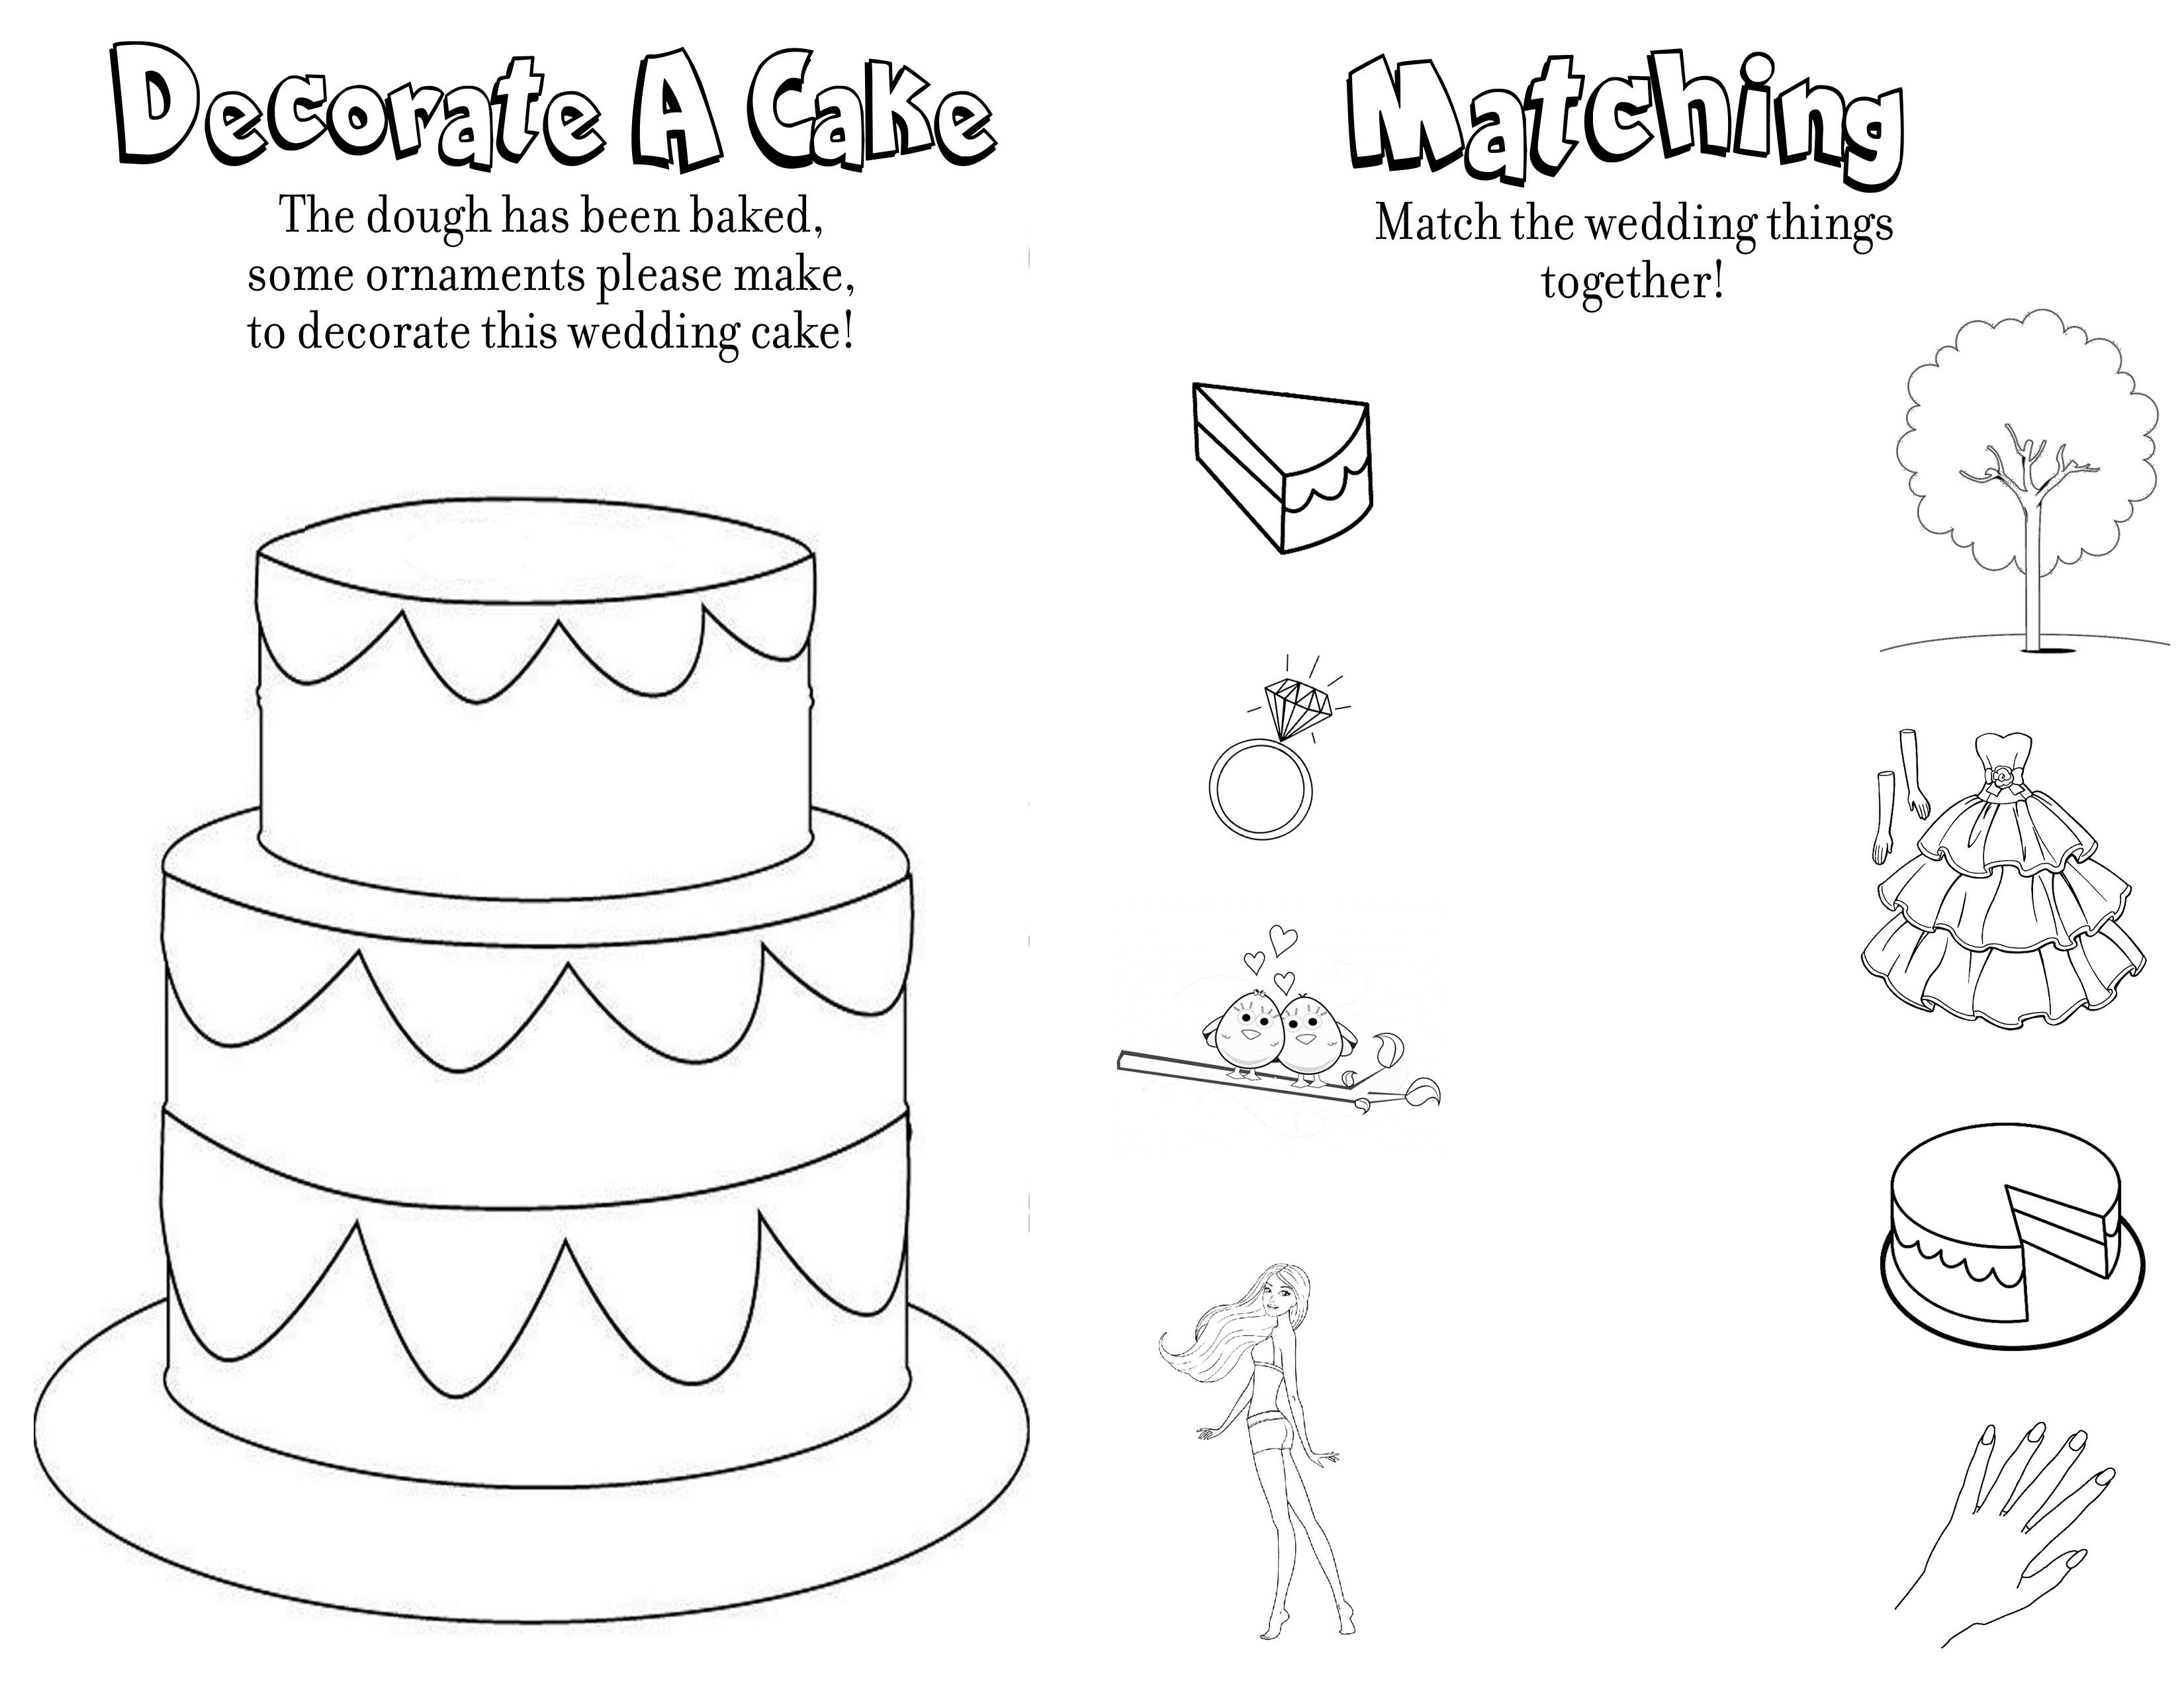 Printable Wedding Coloring Book Free | Coloring Pages - Free Printable Personalized Wedding Coloring Book